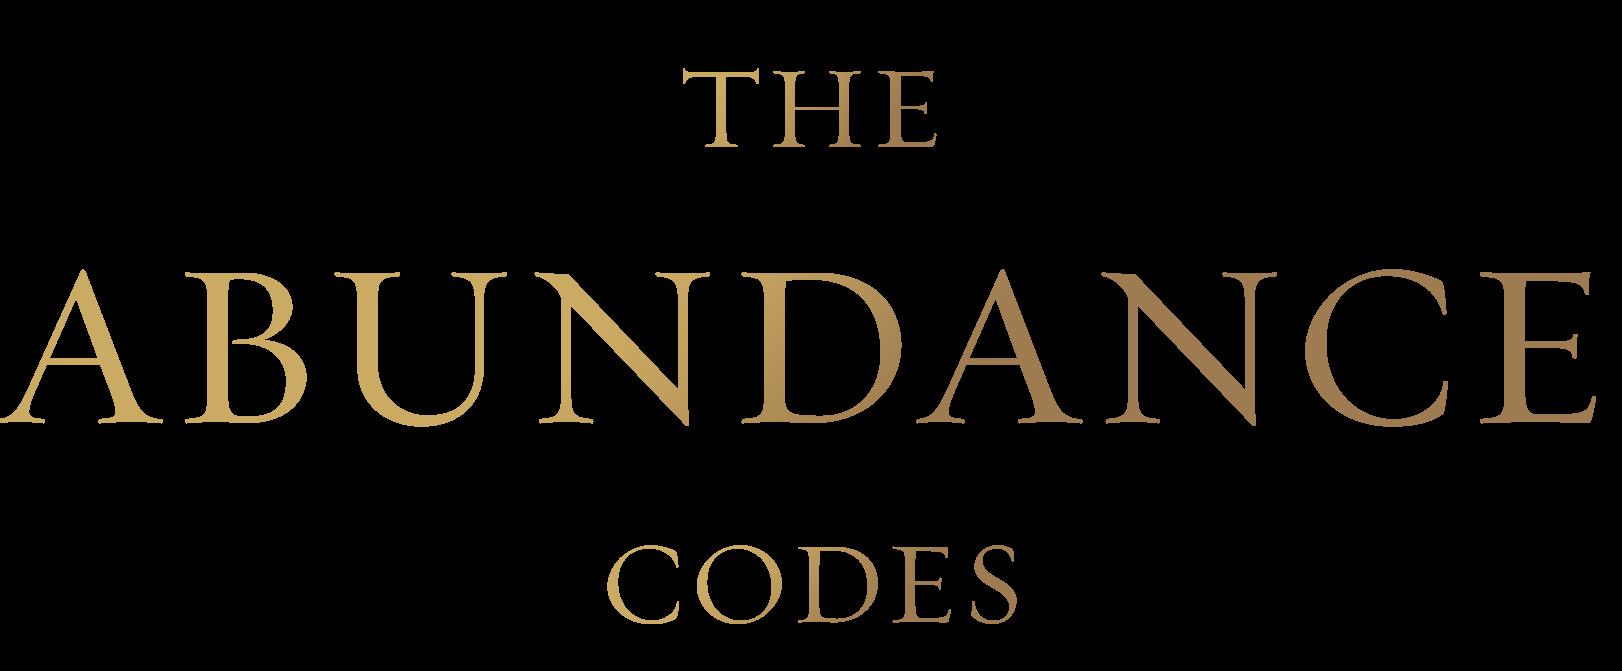 The Abundance Codes